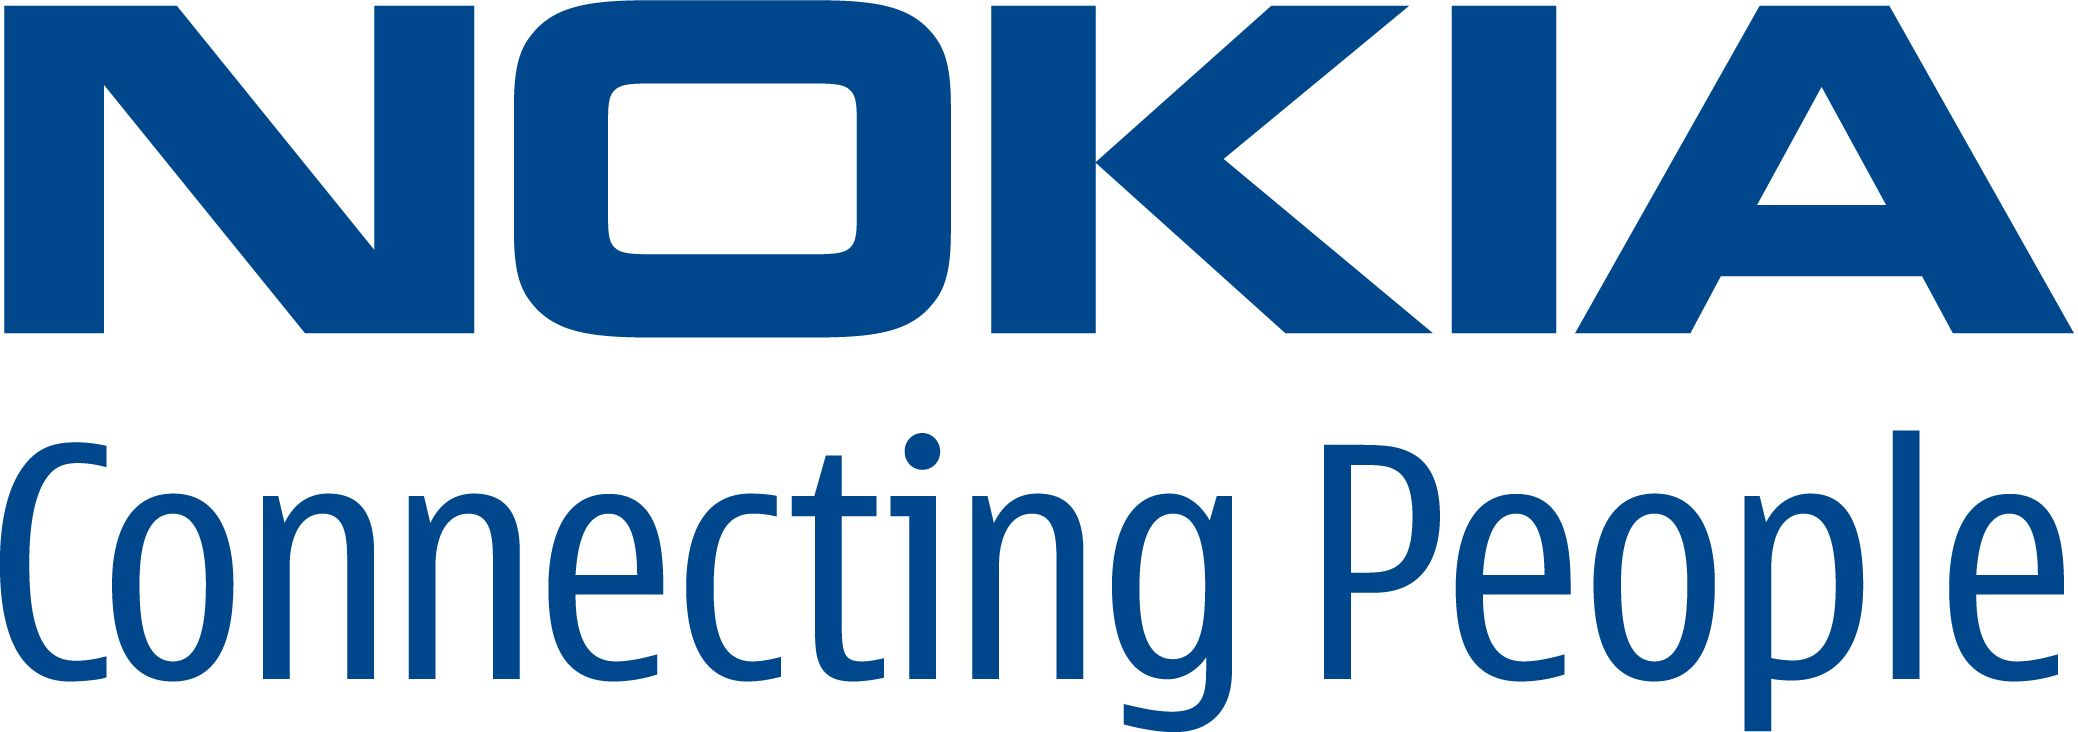 lg logo png transparent background. nokia logo png transparent background lg